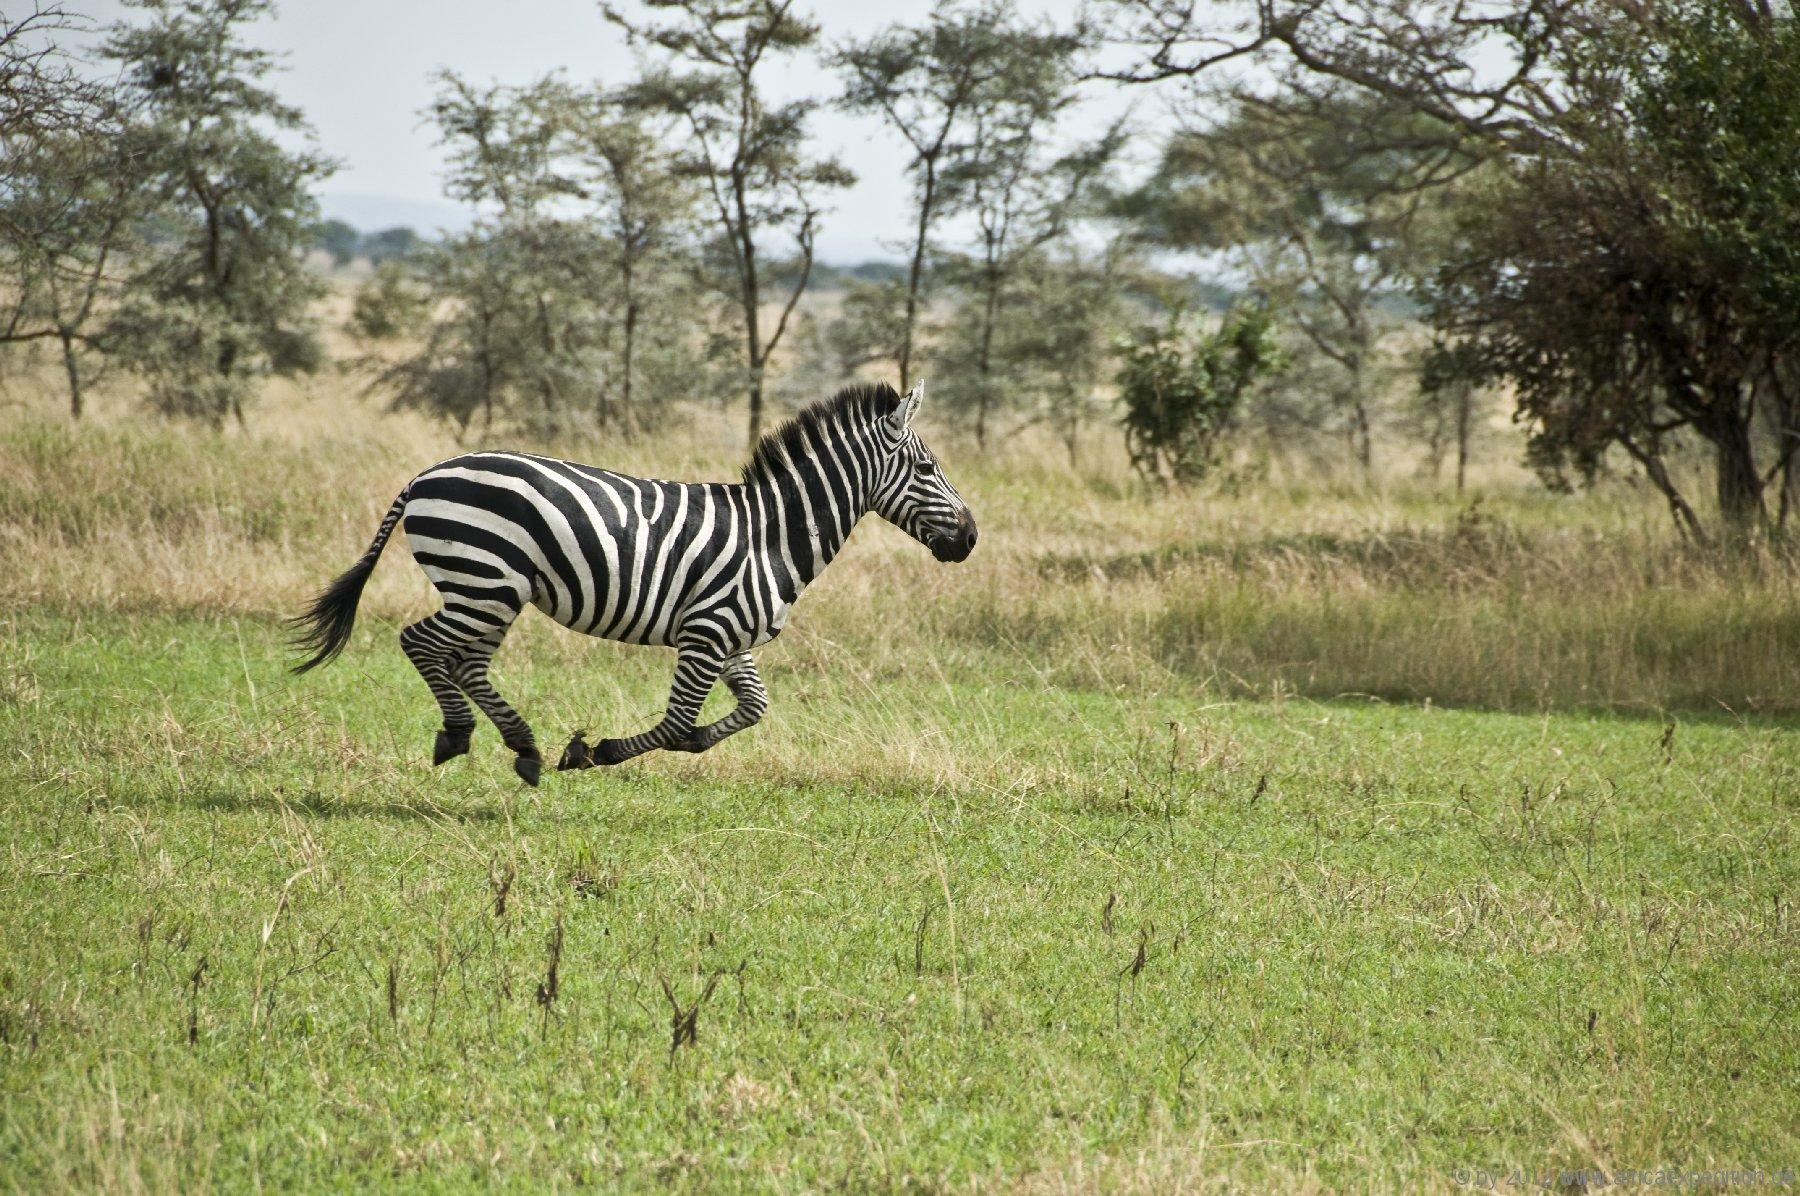 tanzania_africaexpedition_de_007